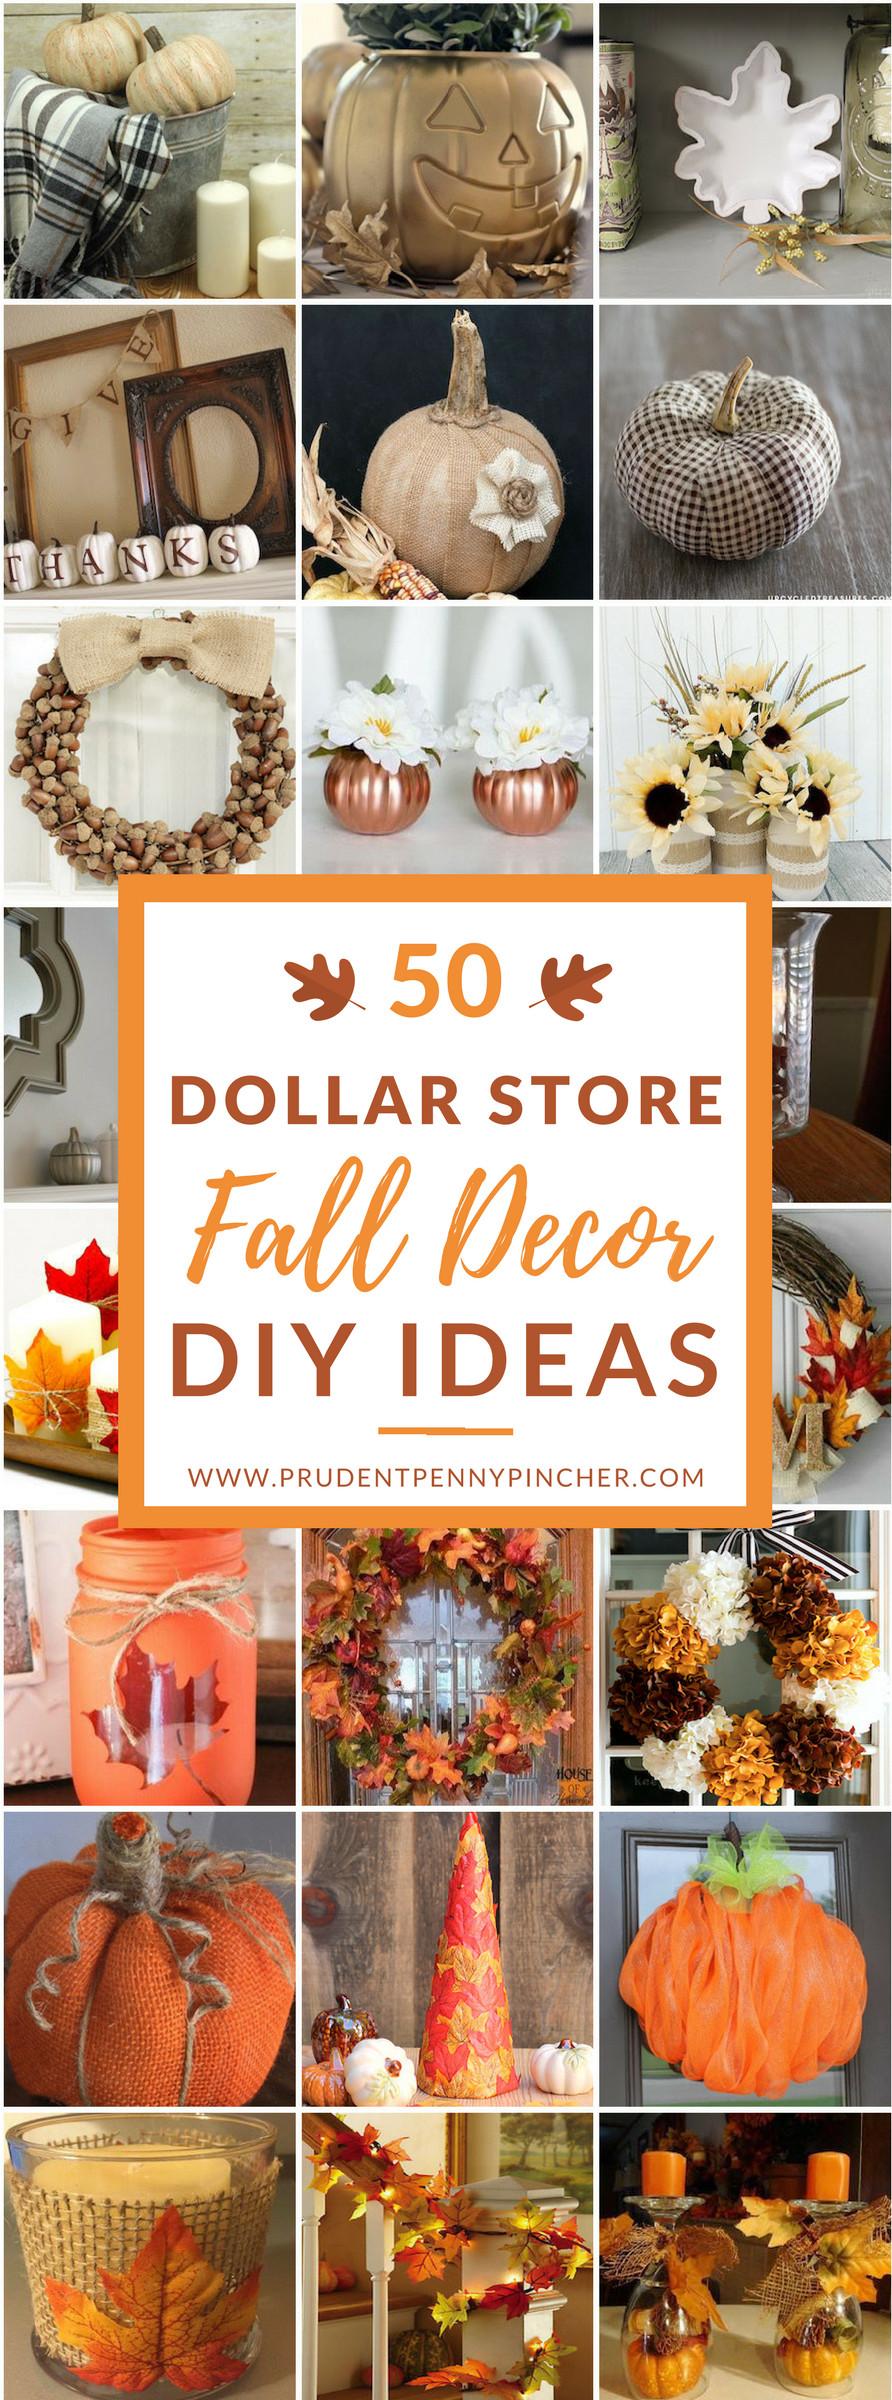 Fall Decorating Ideas DIY  50 Dollar Store Fall Decor DIY Ideas Prudent Penny Pincher